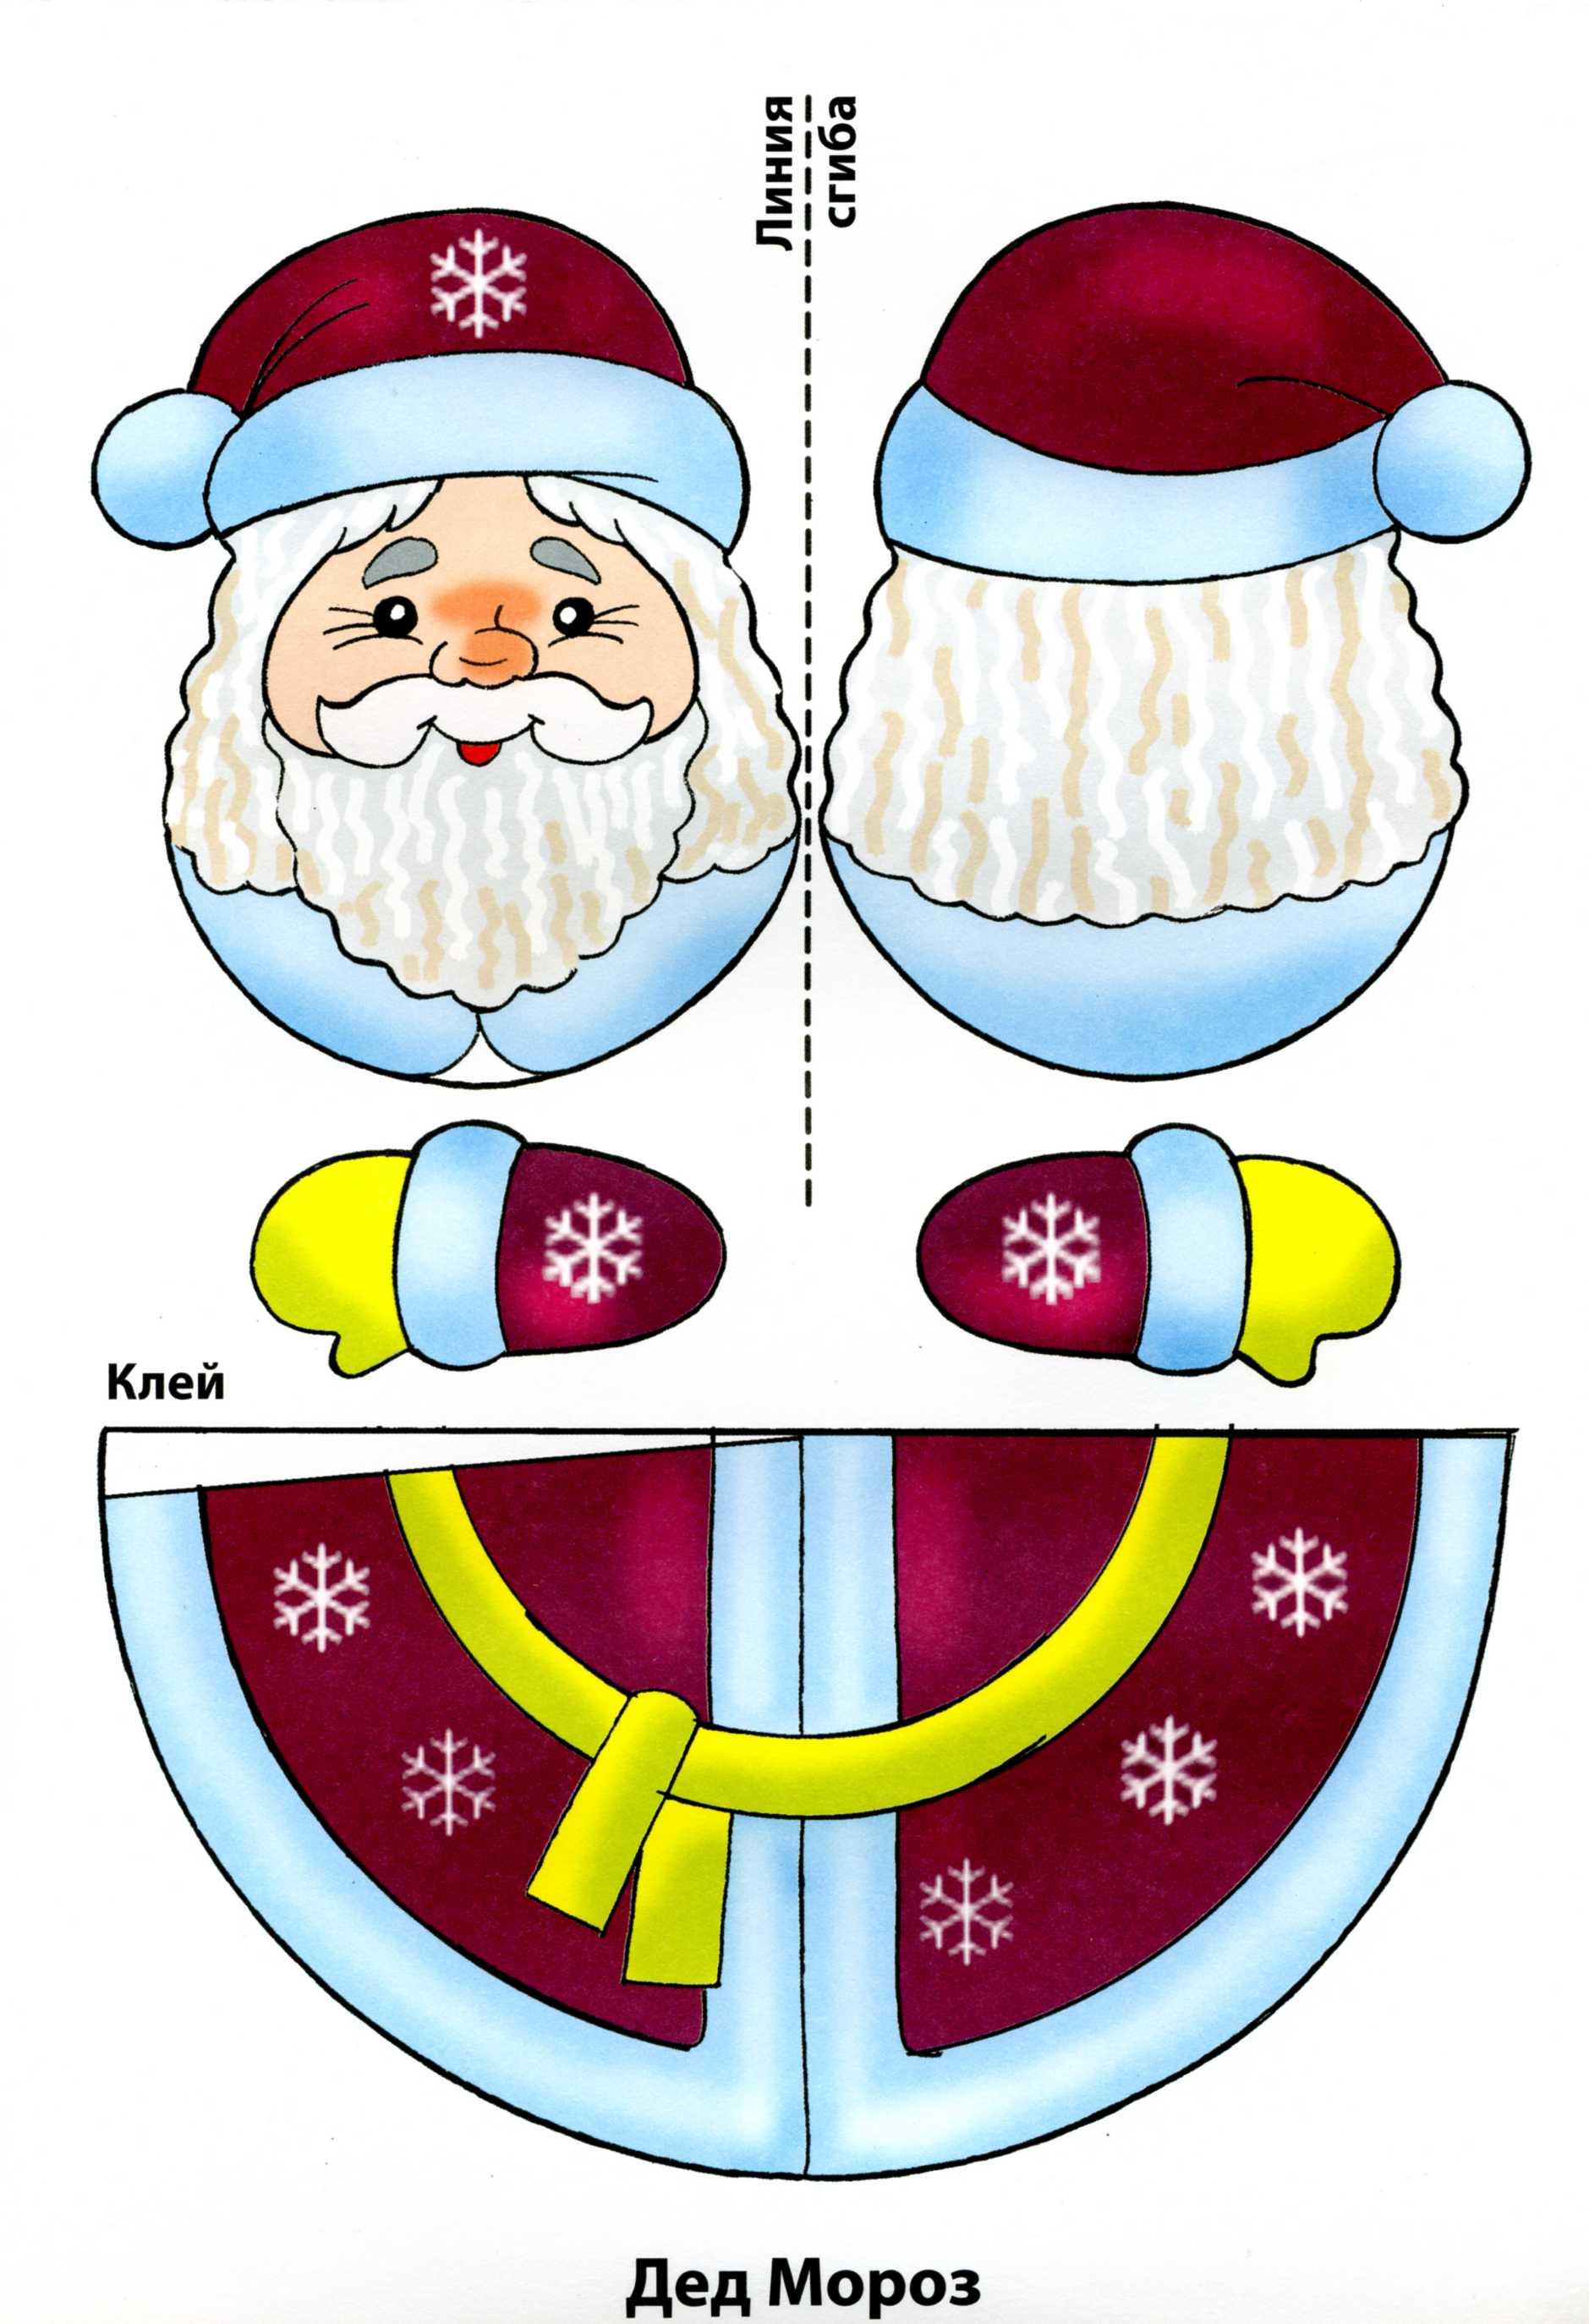 Дед мороз из конусов своими руками